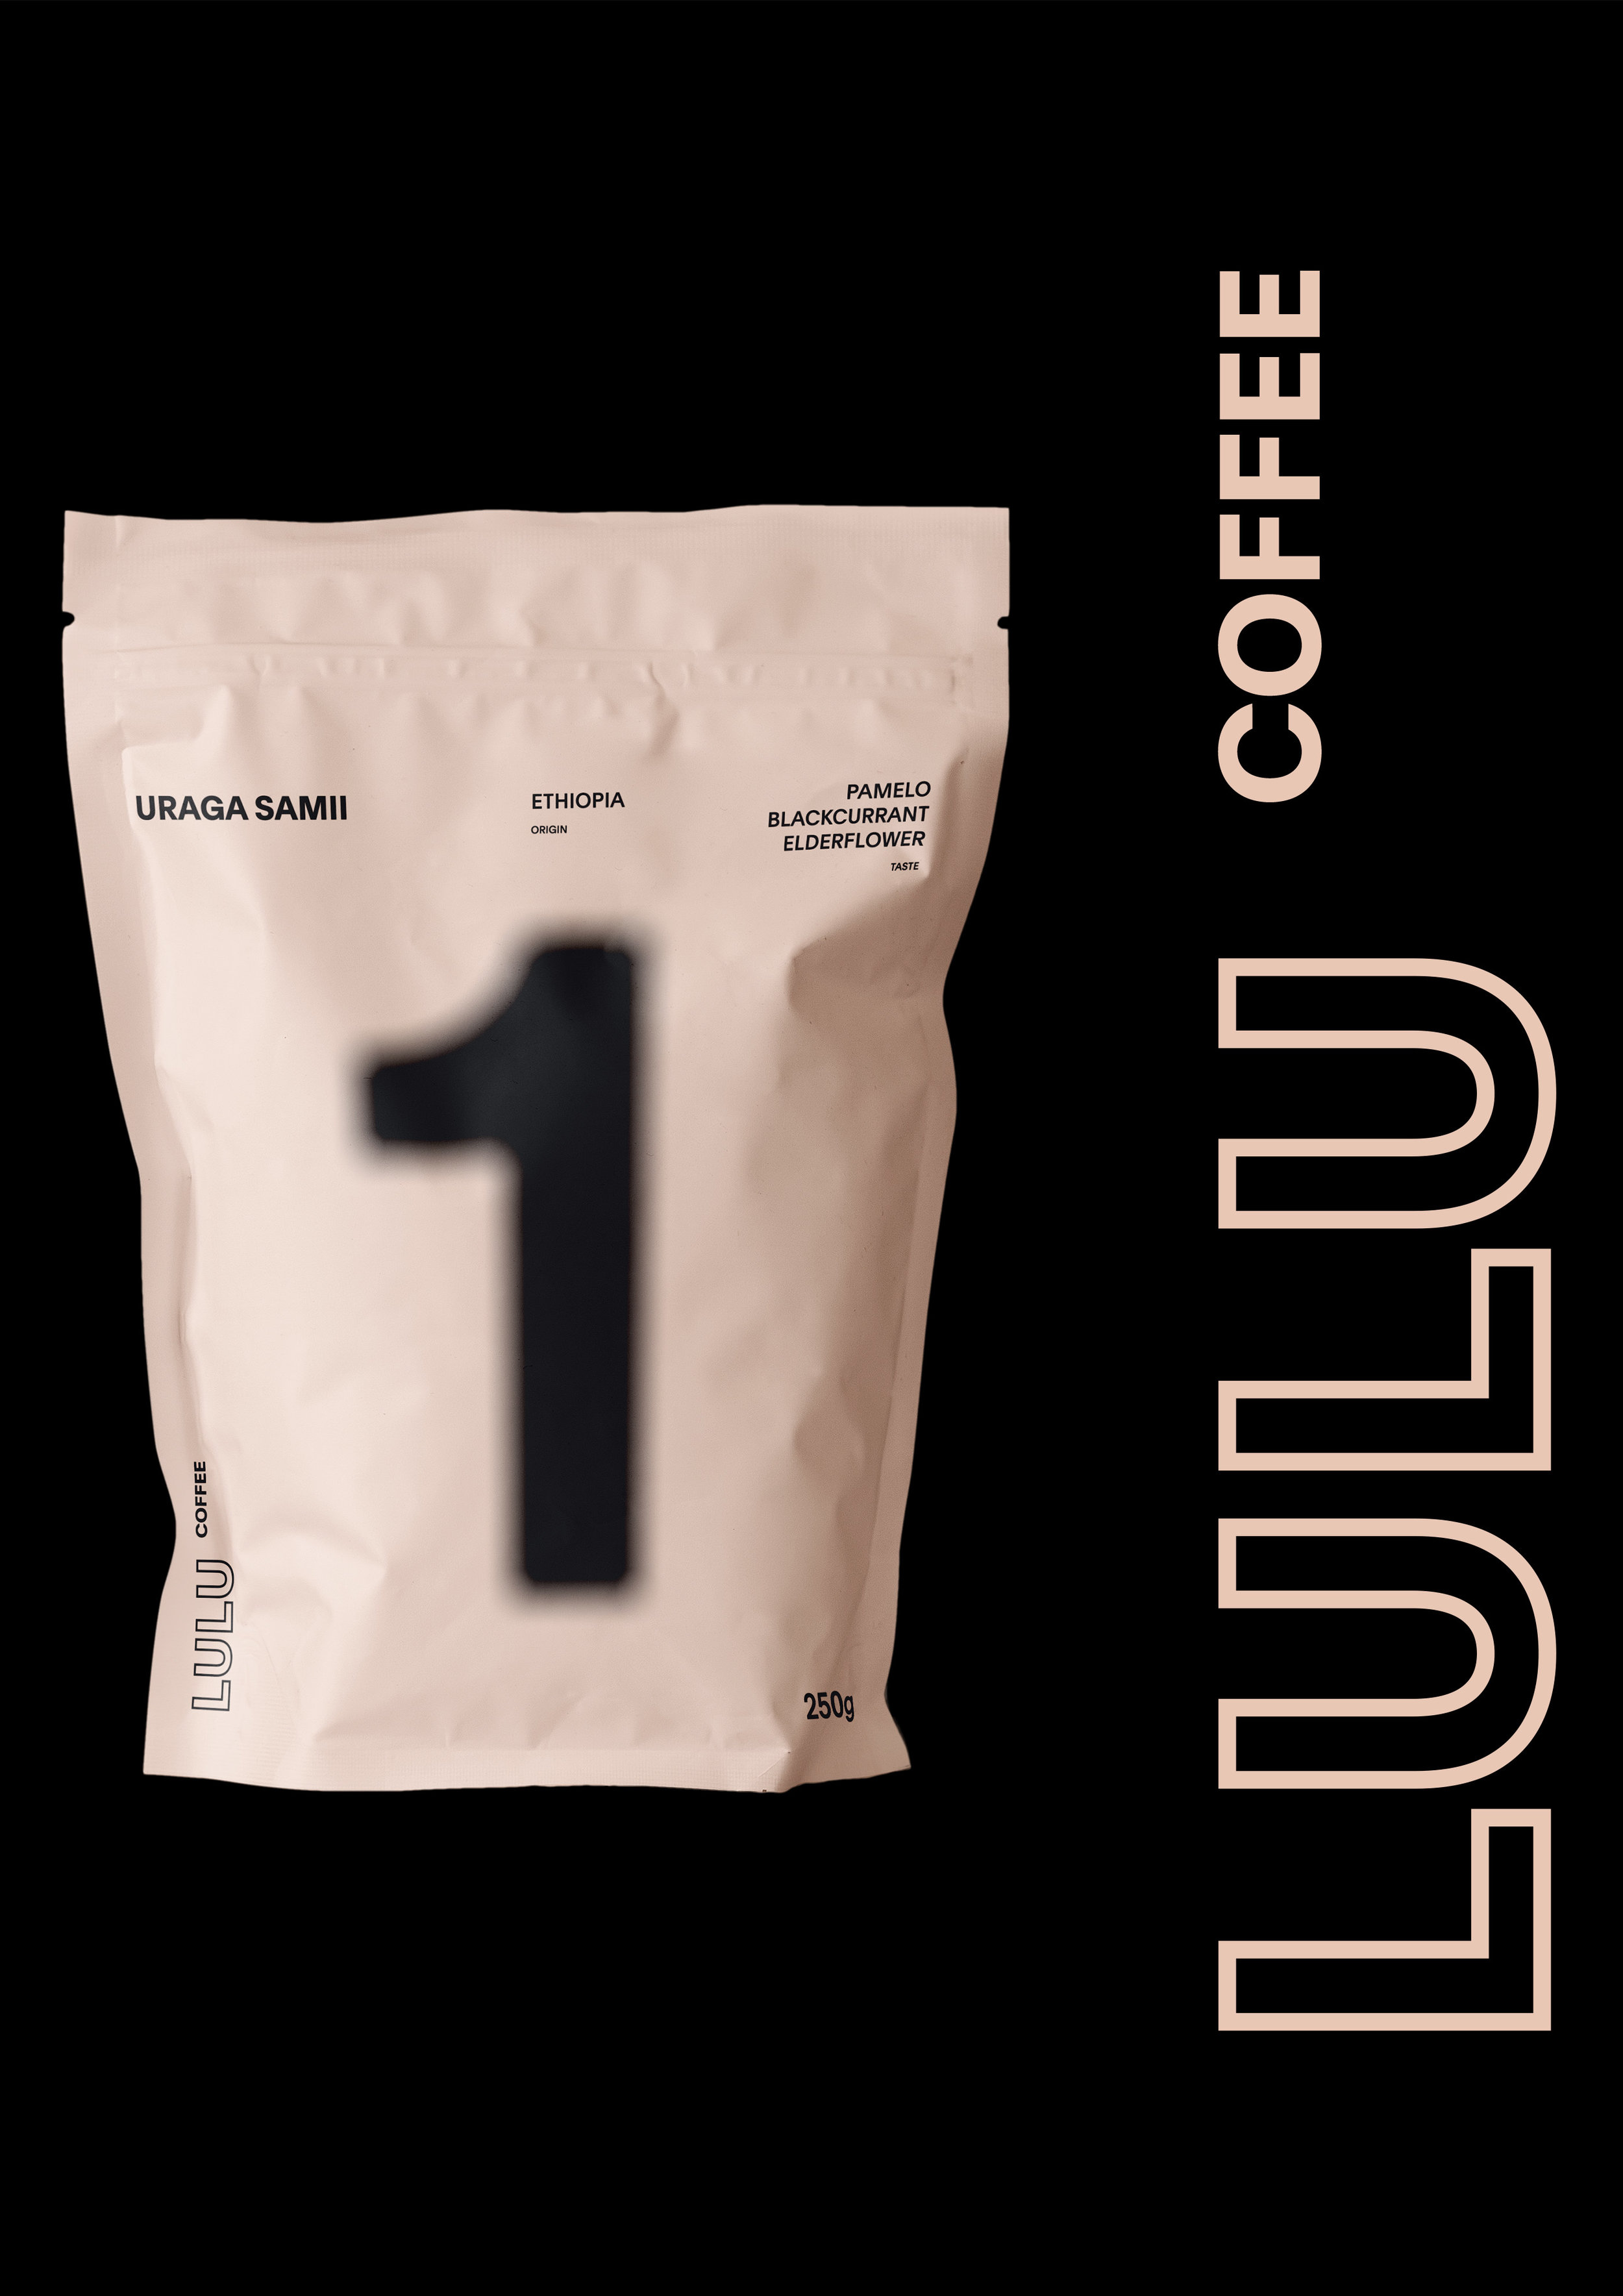 sleepless_creative_lulu_coffee_web_1.jpg